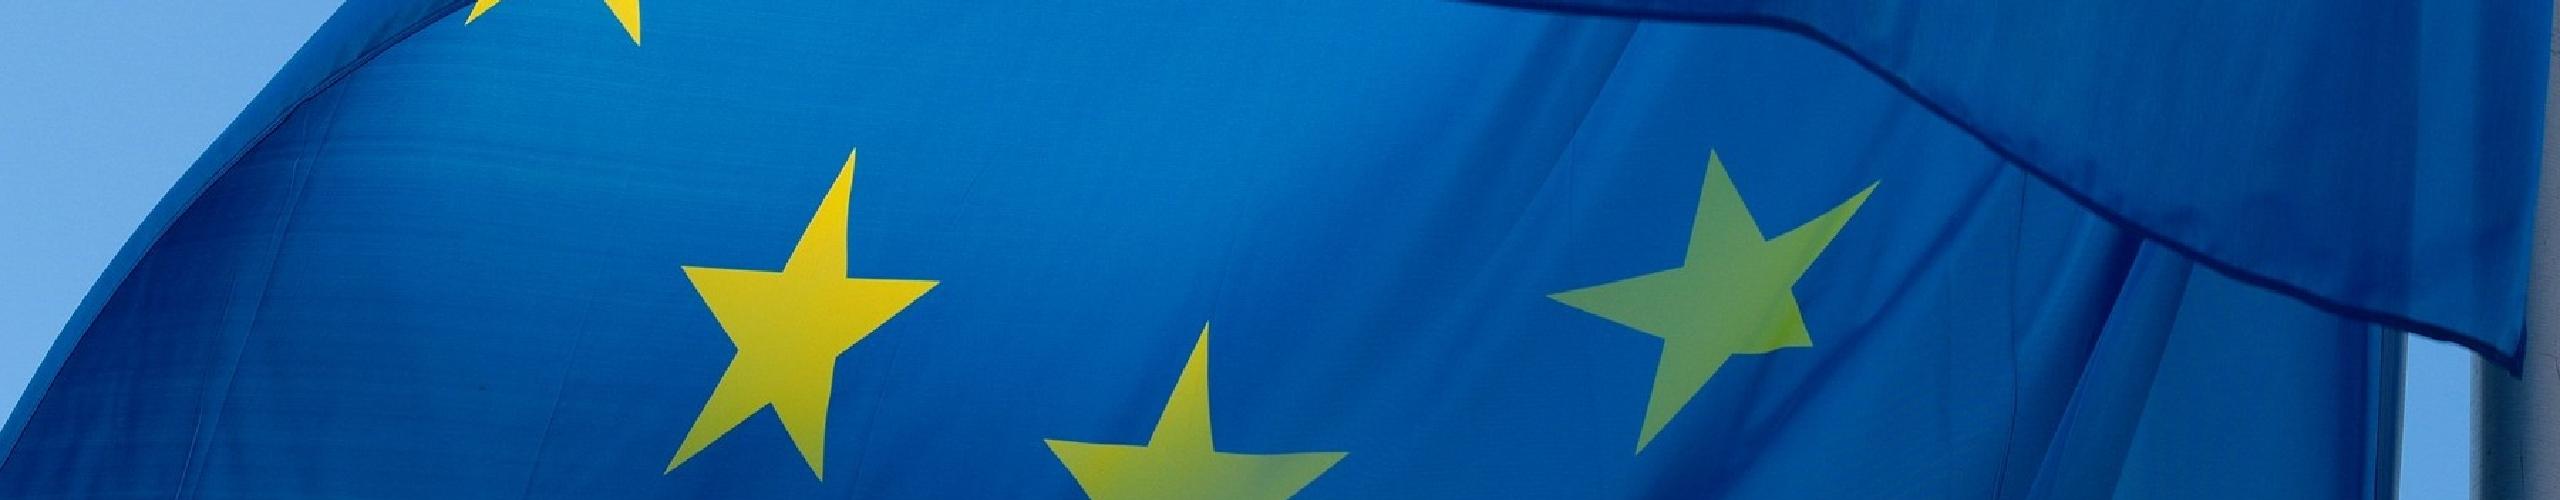 EU flag panel background